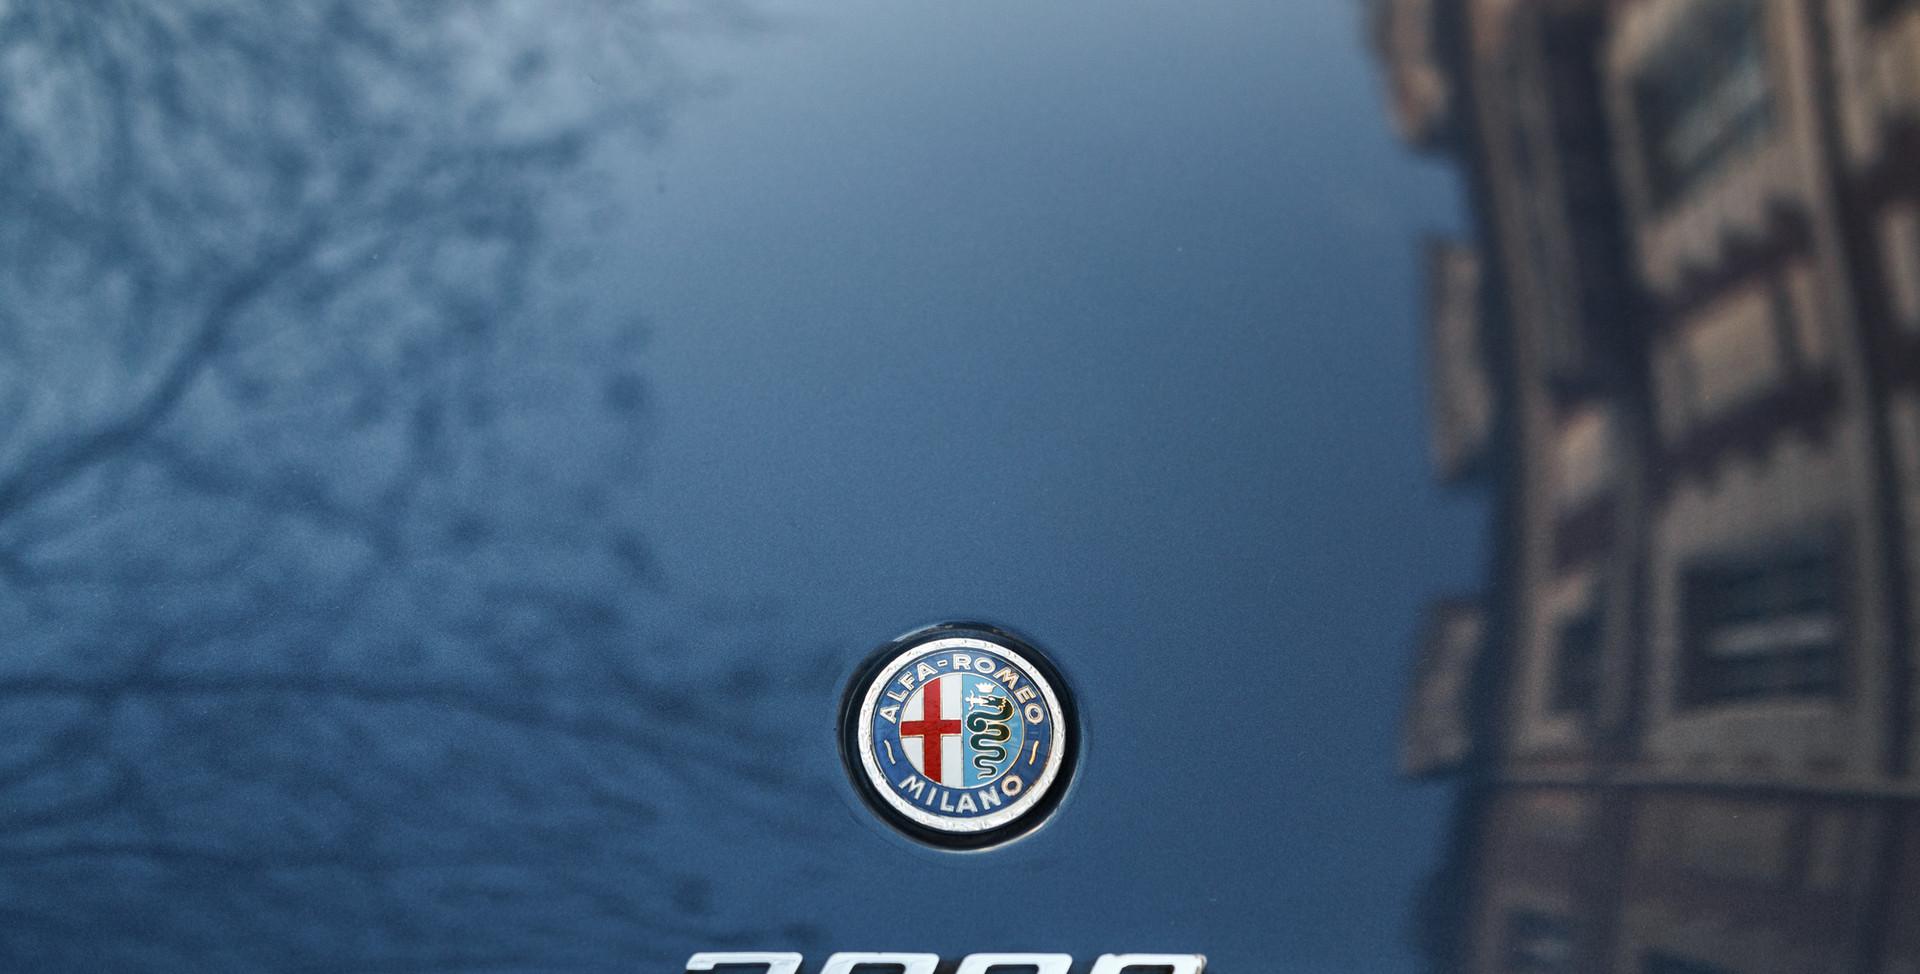 Alfa_Romeo_2000_détail_(12).jpg